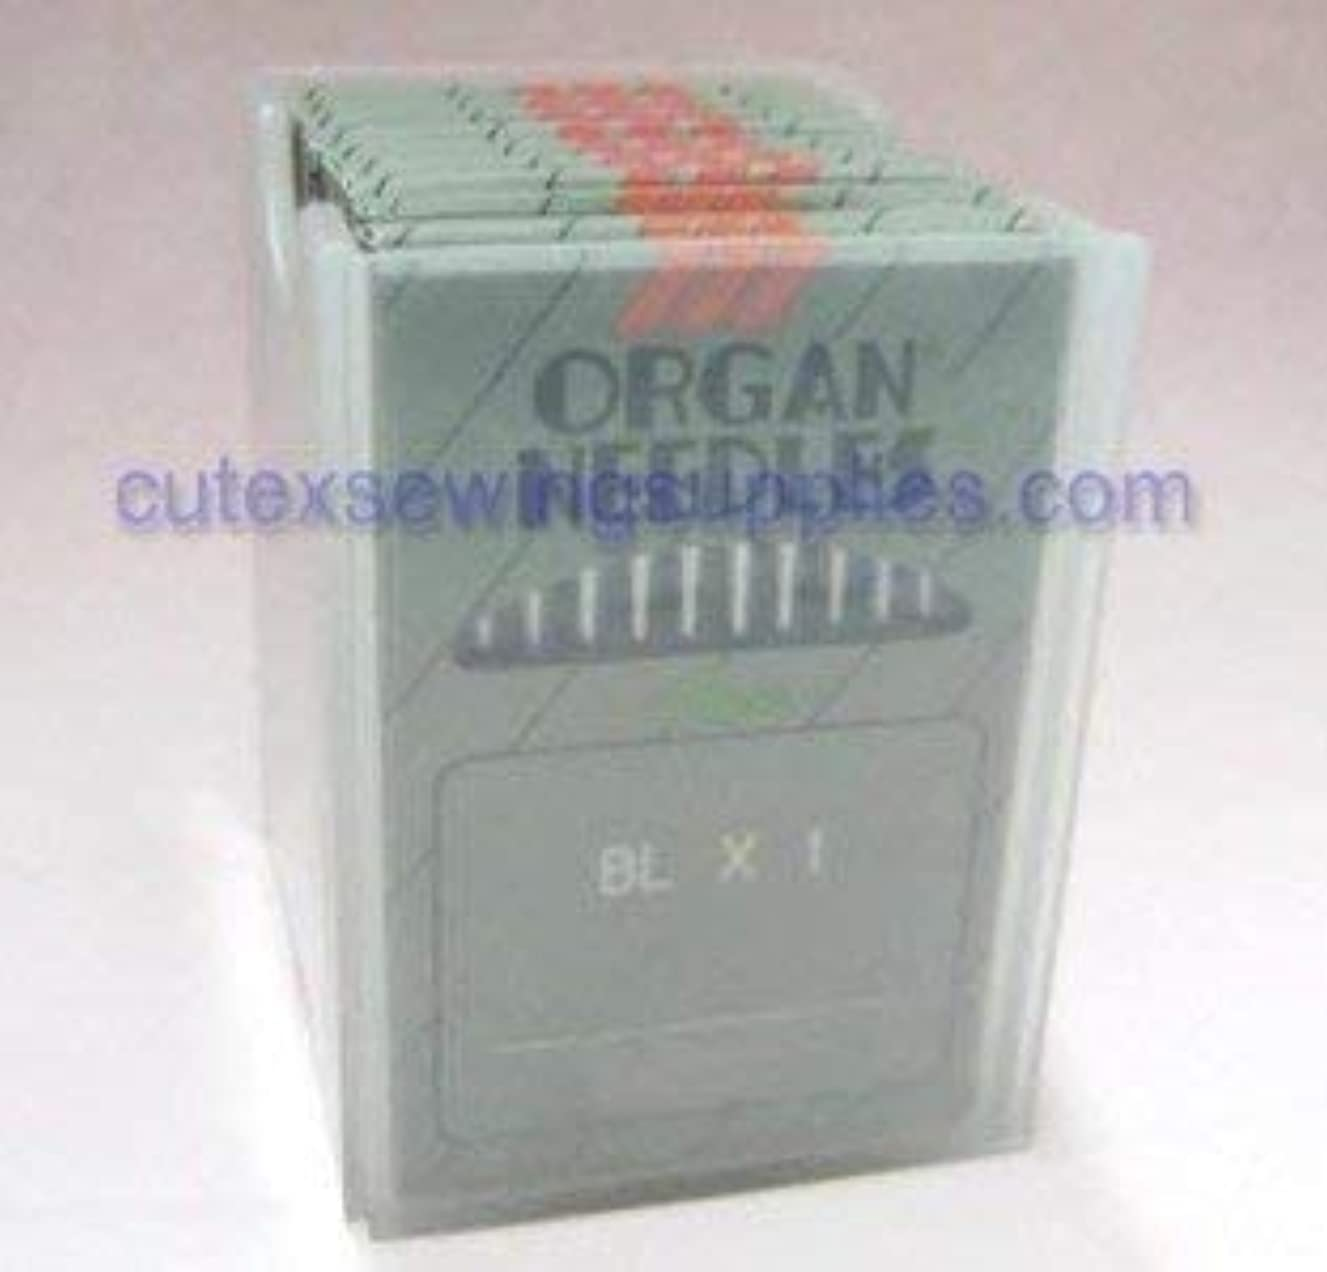 100 ORGAN BLX1 Portable Serger Needles For Babylock Bernette (Size 11 (metric 75))